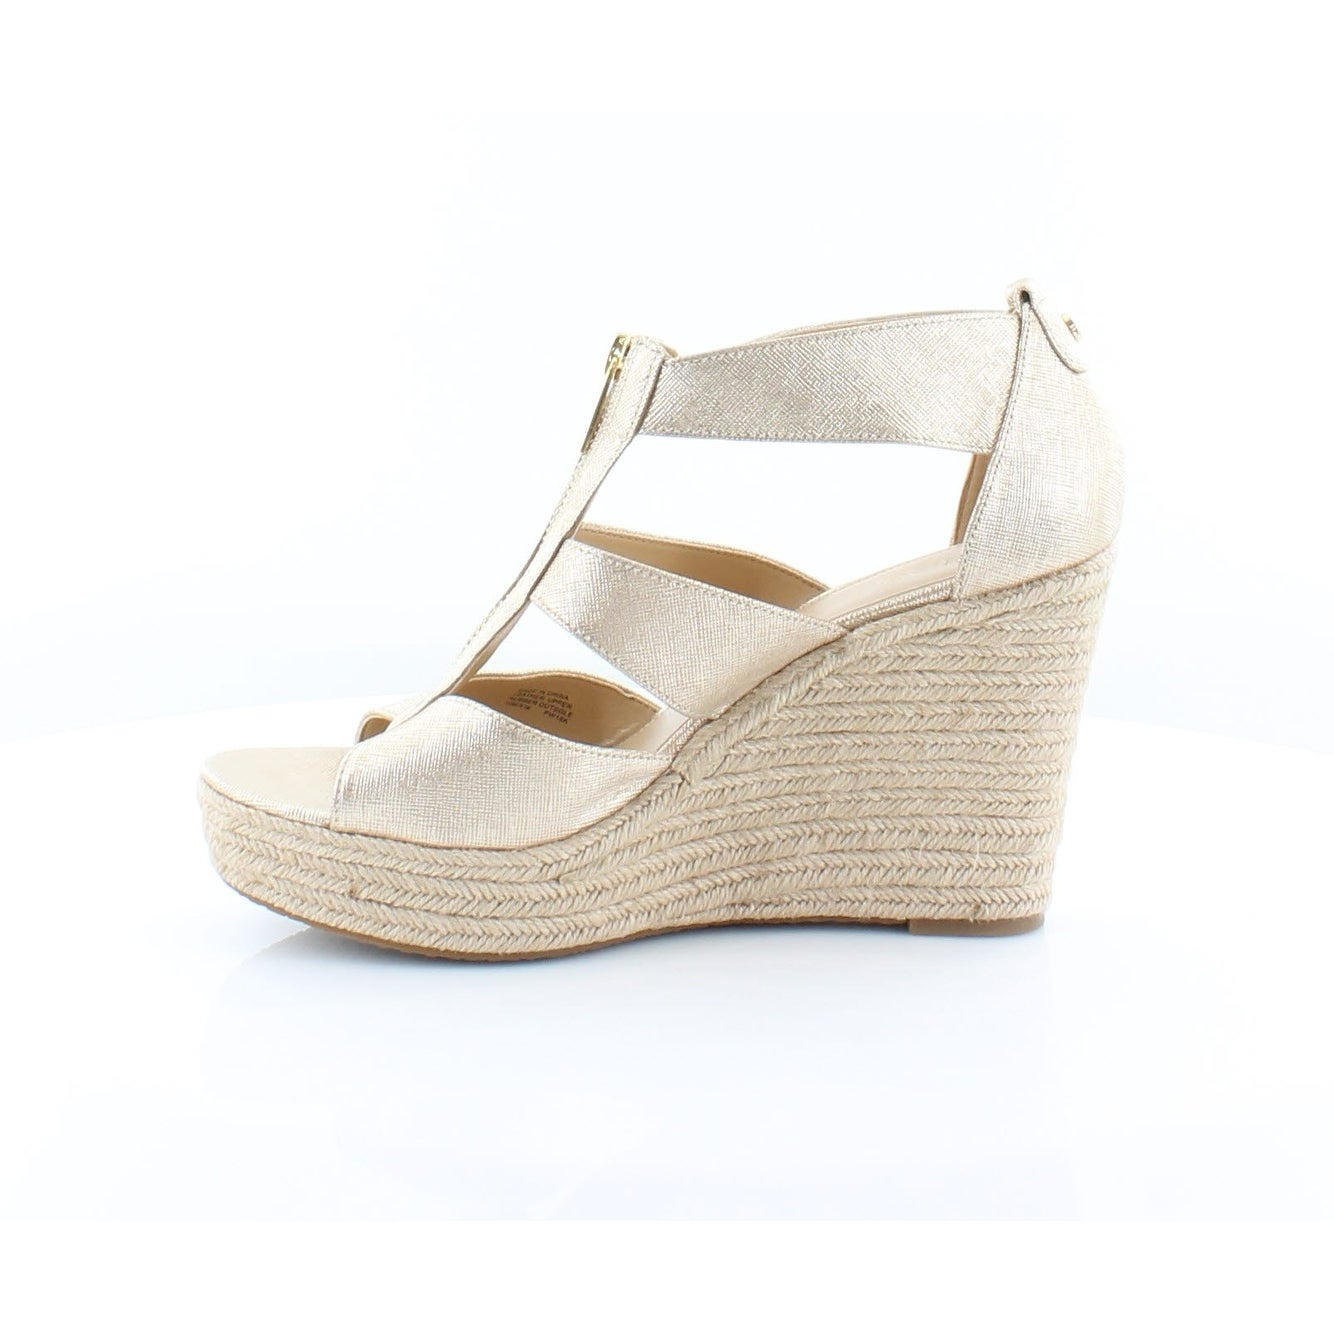 052446df872c Shop Michael Kors Damita Wedge Women s Heels Pale Gold - Free Shipping  Today - Overstock - 23549226